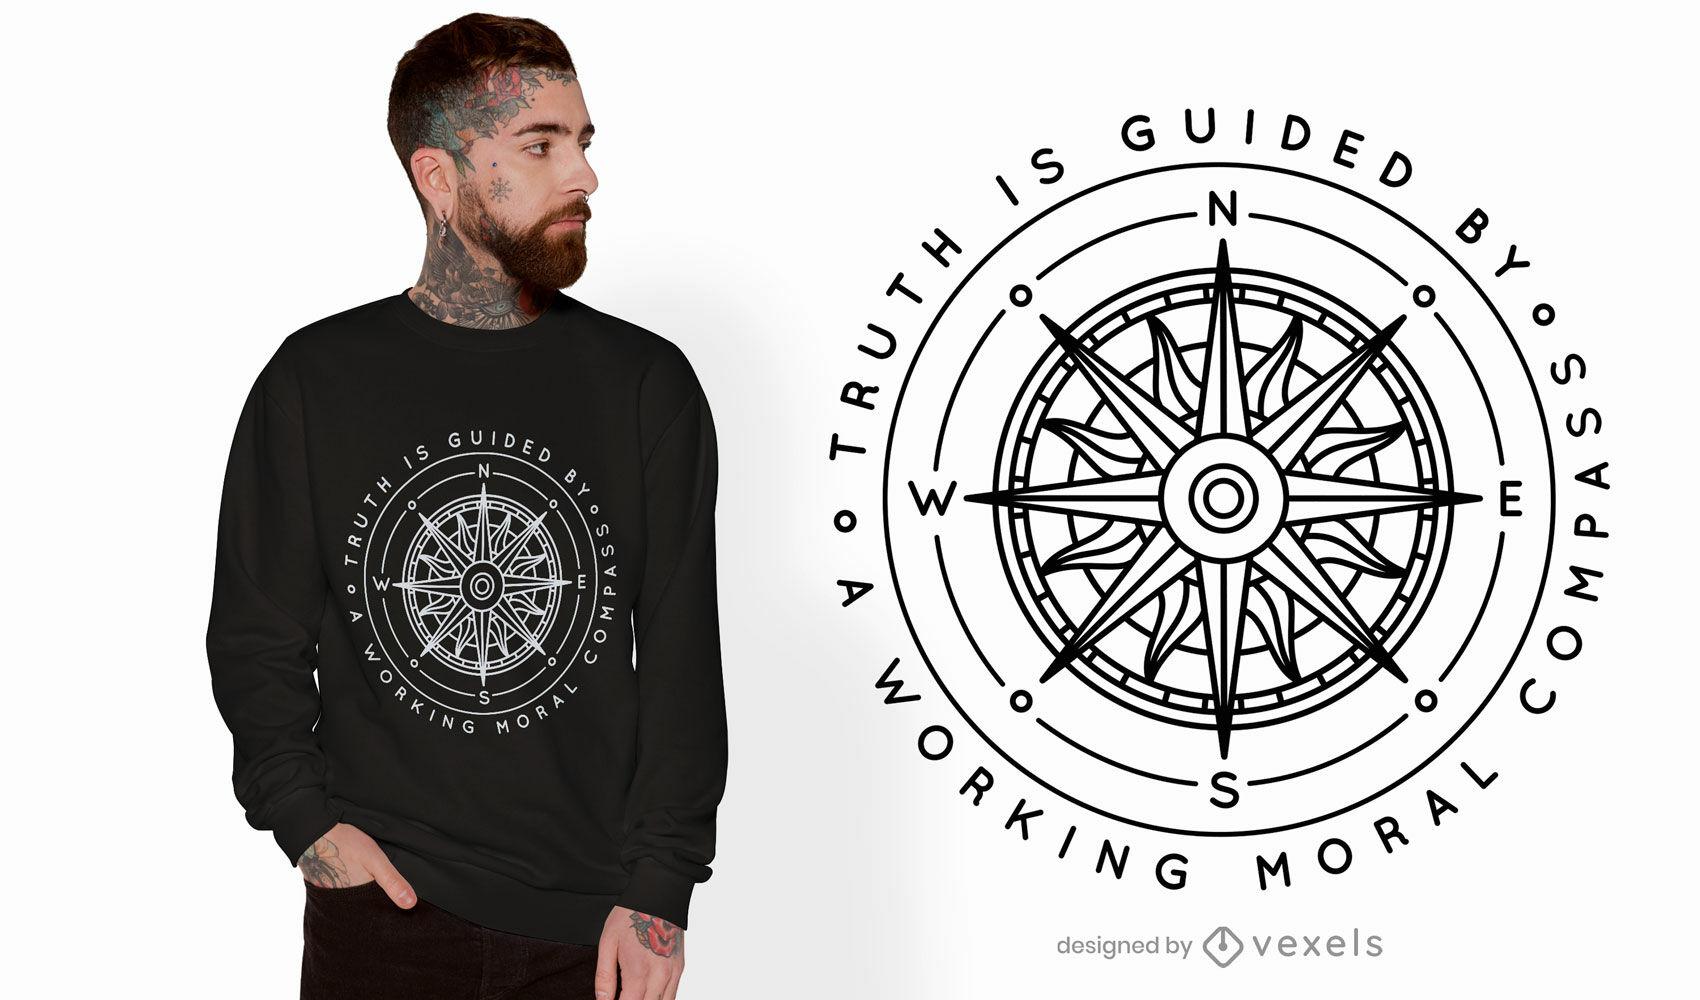 Moralisches Kompasszitat-T-Shirt-Design